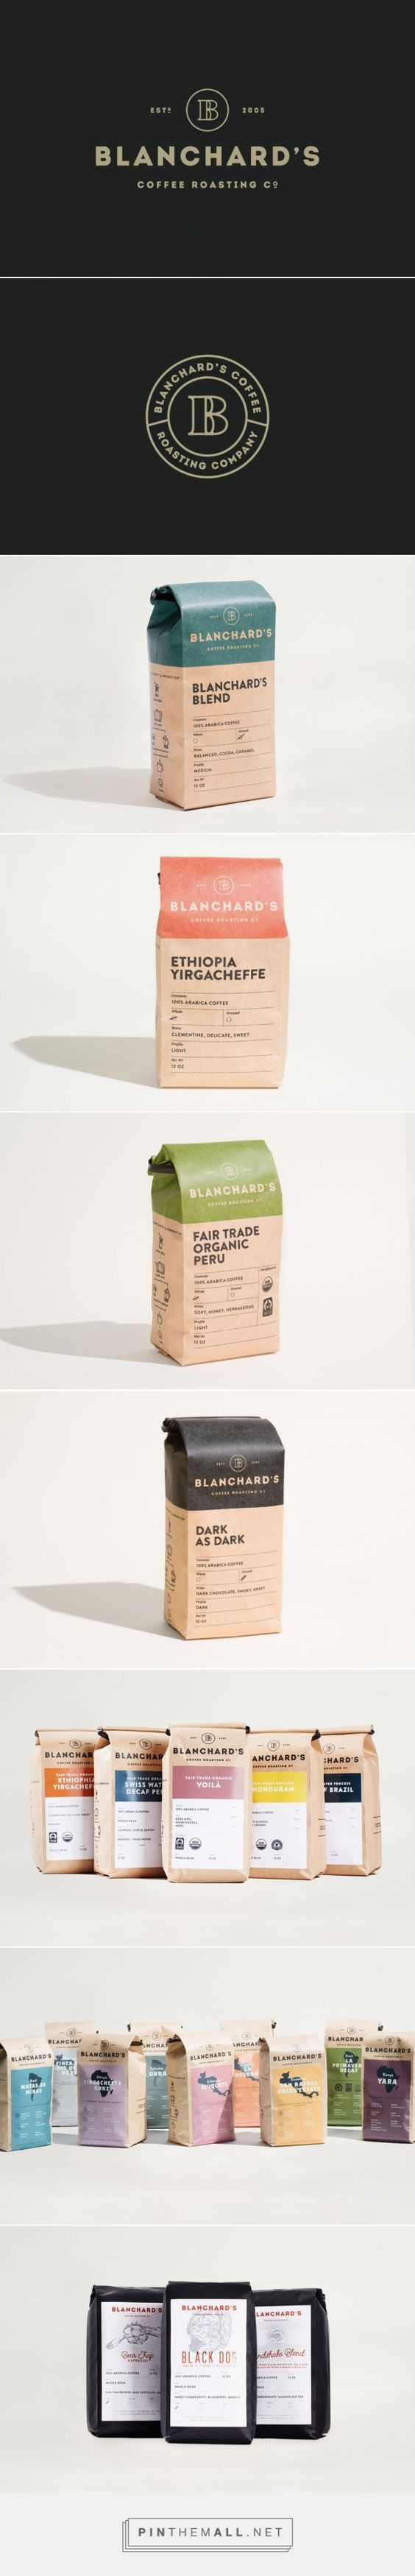 Blanchard's — Skirven & Croft   Packaging Design   Pinterest / Ideas / Inspiration / Food / Coffee / Organic / Natural / Retro / Vintage / Minimalist / Branding / Paper Bag